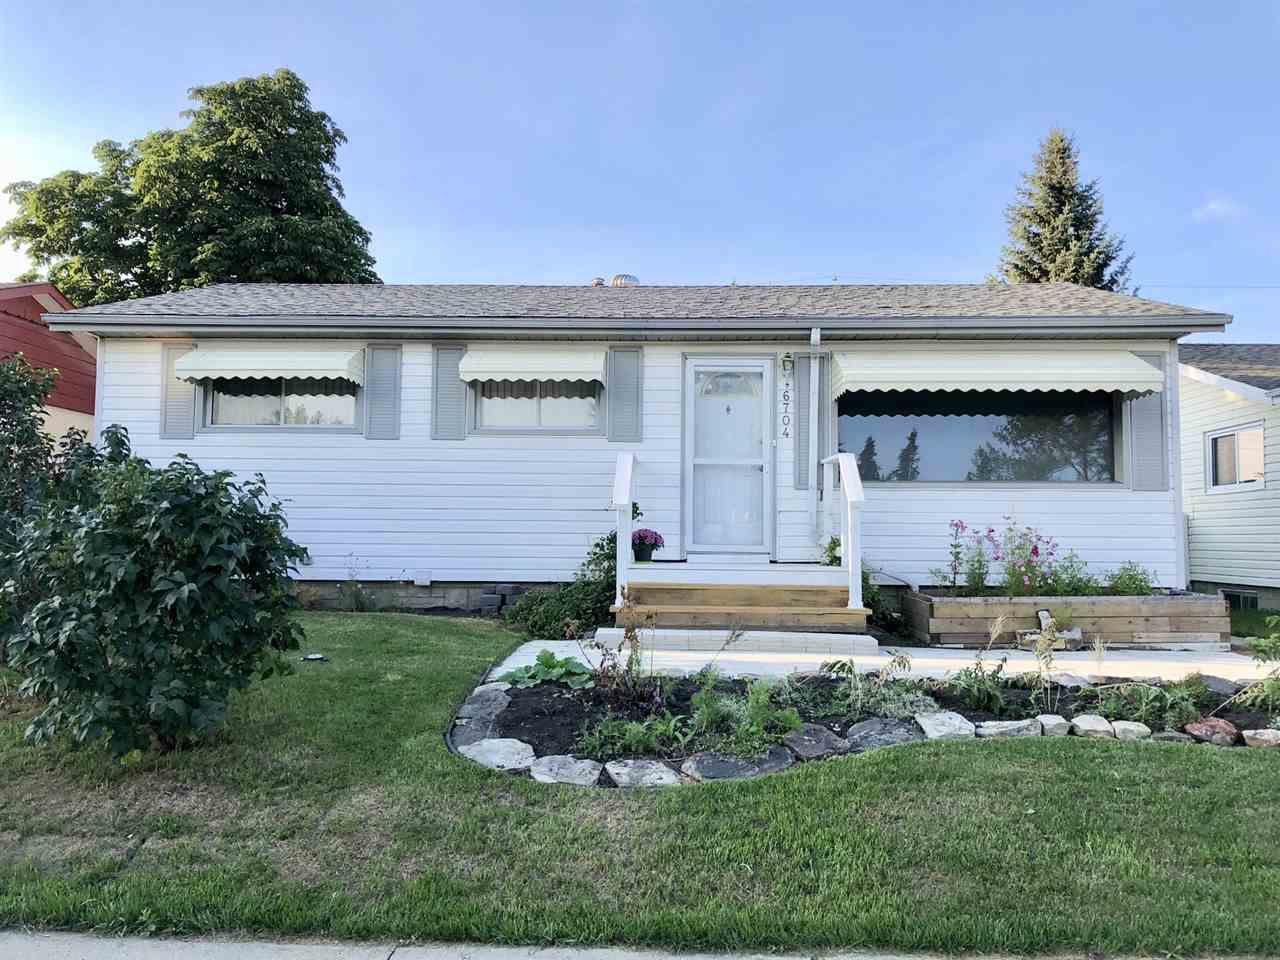 Main Photo: 6704 132 Avenue in Edmonton: Zone 02 House for sale : MLS®# E4158576